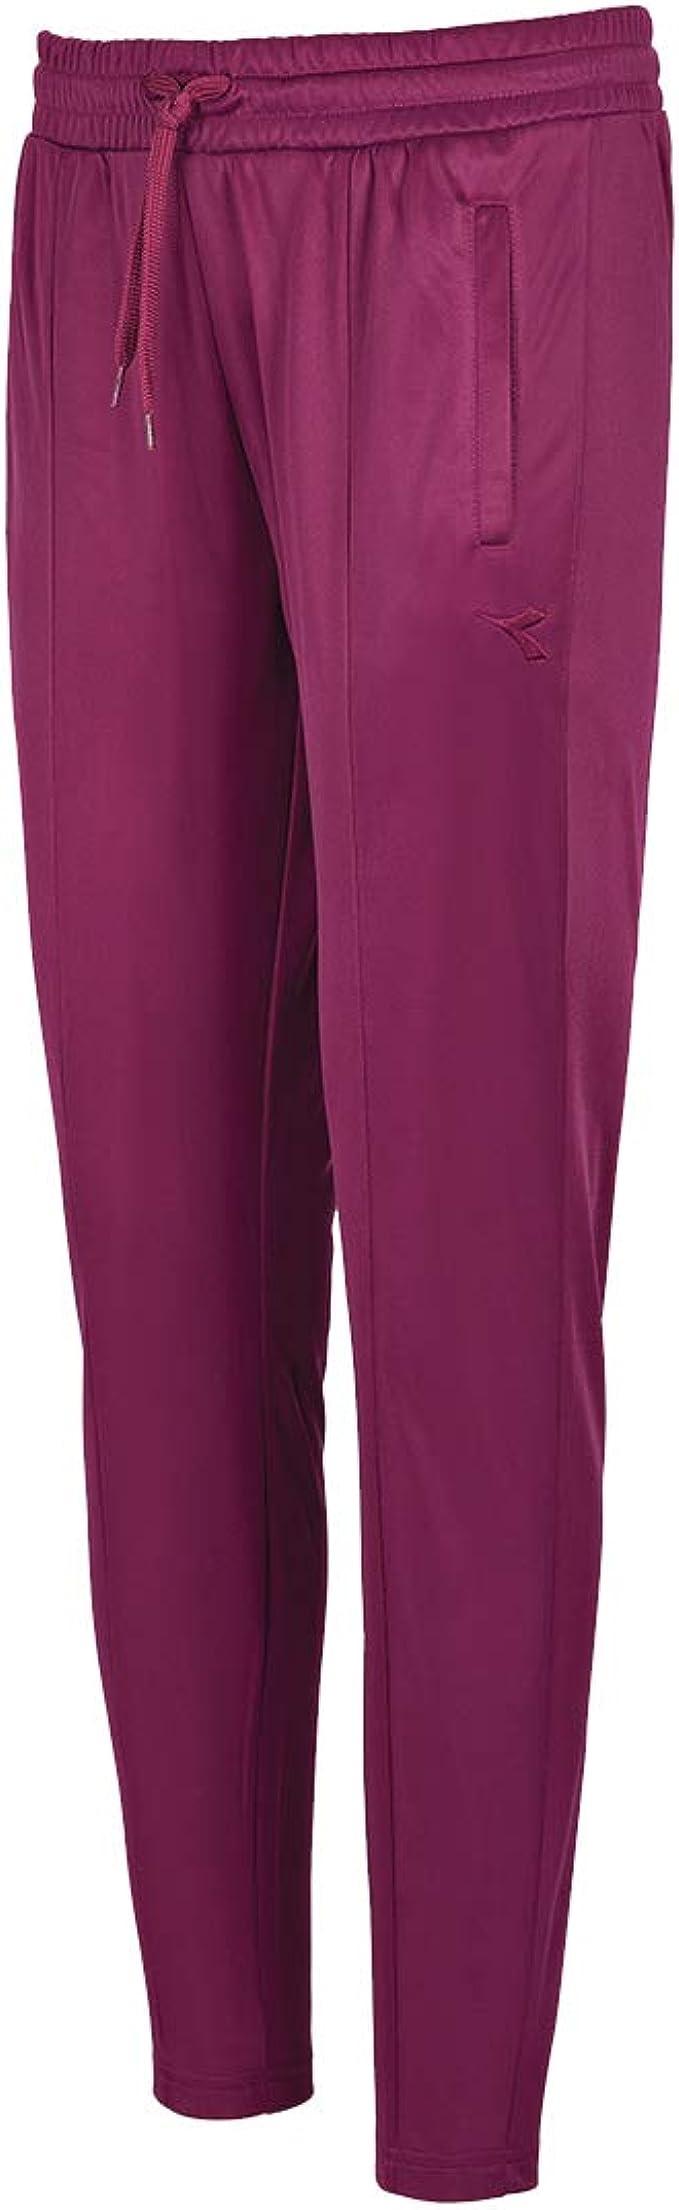 Diadora - Chandal L.Light Suit CHROMIA para Mujer: Amazon.es: Ropa ...